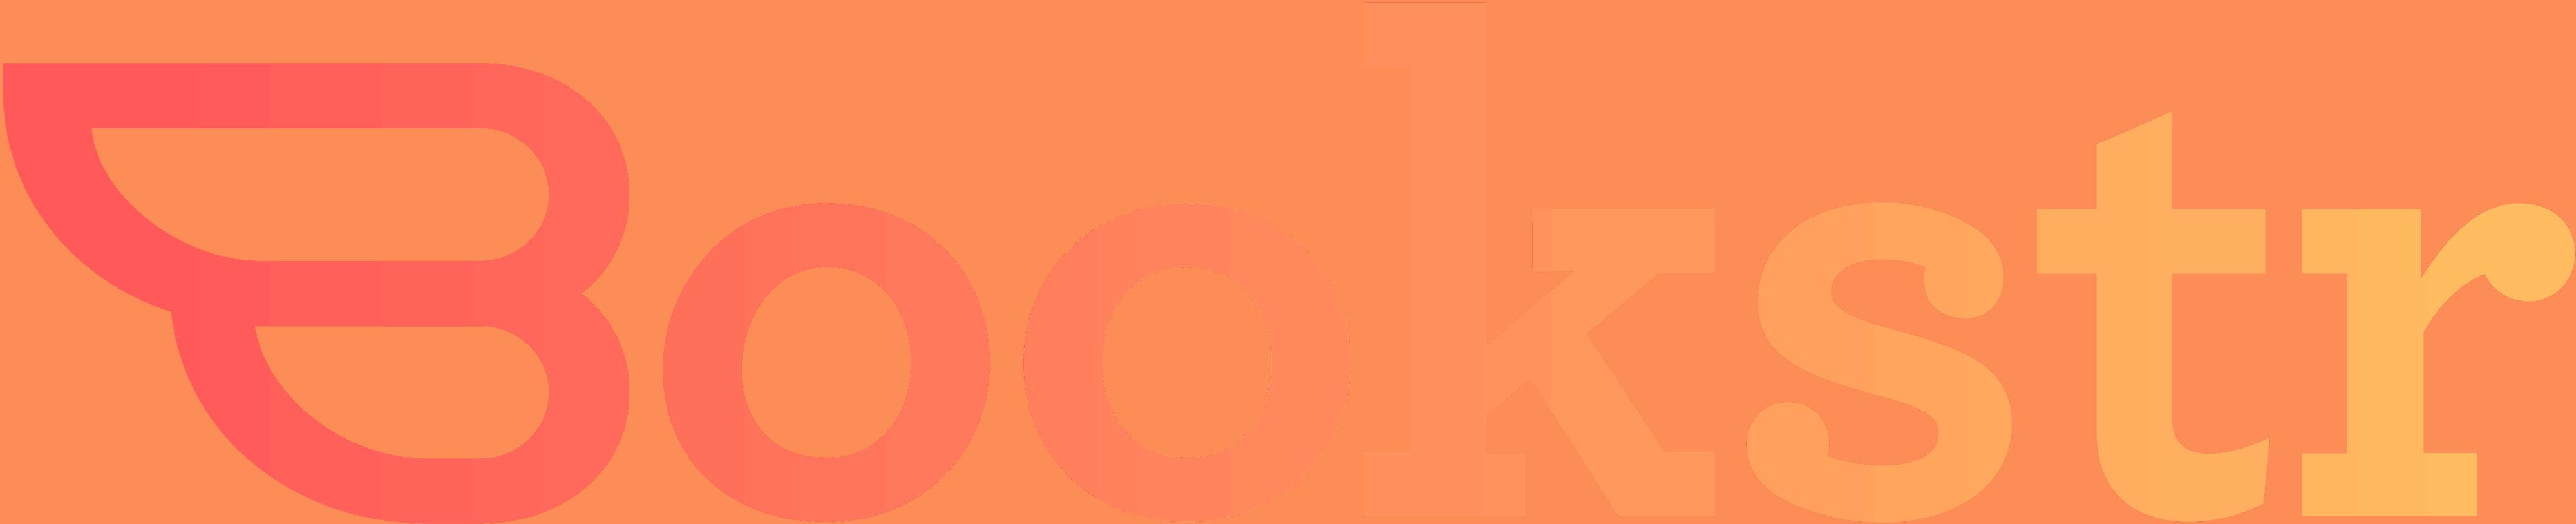 Bookstr logo